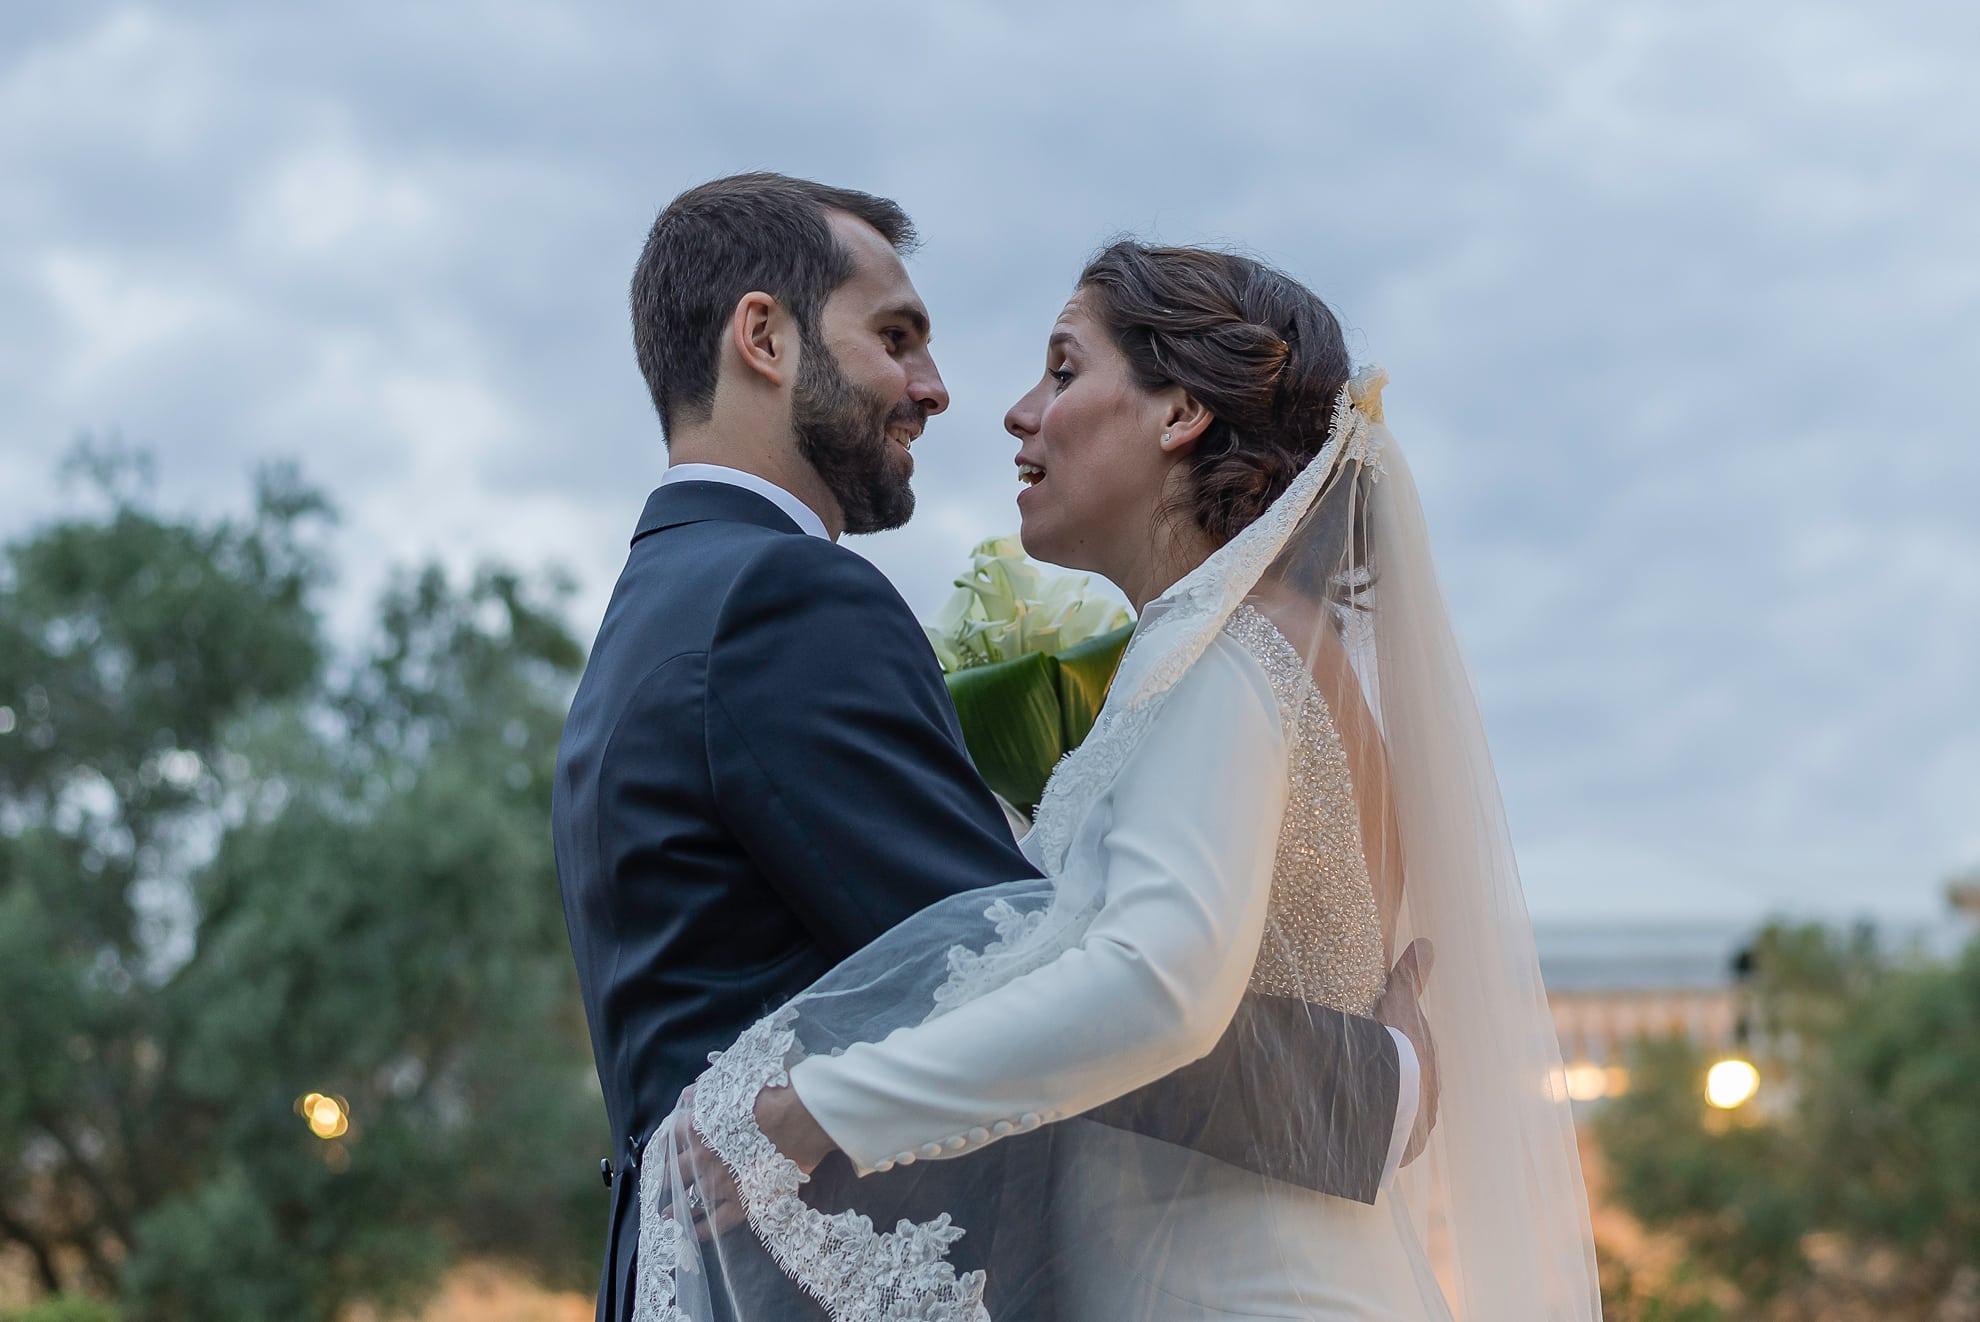 La fotógrafa de tu boda Ana Porras - Fotos y Bodas - Bárbara y Bruno